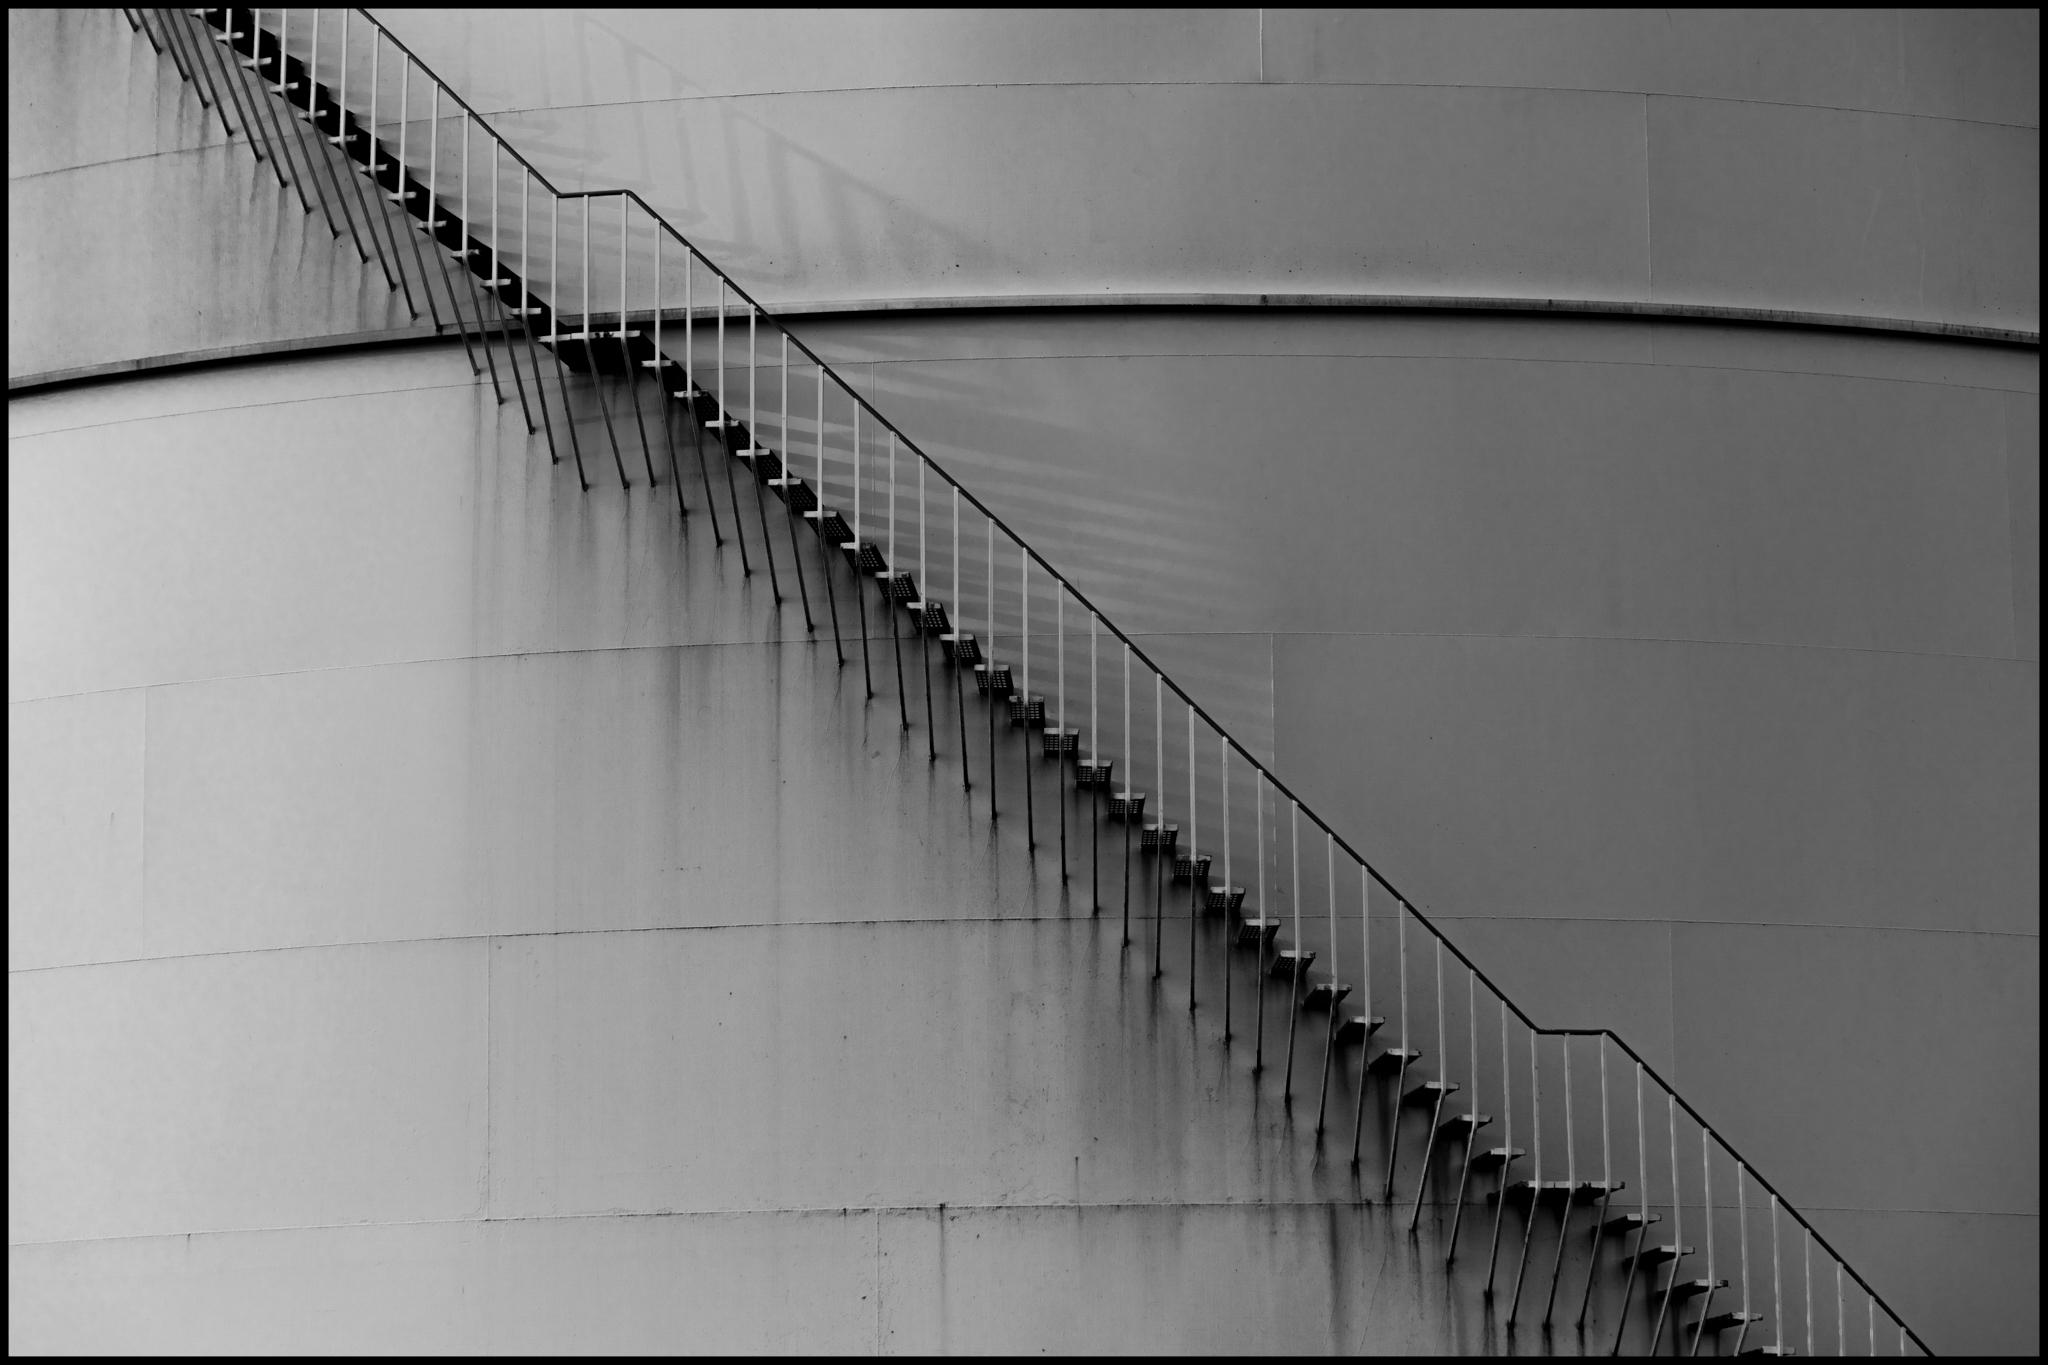 19 June 2019 - Metal stairs, Manchester UK